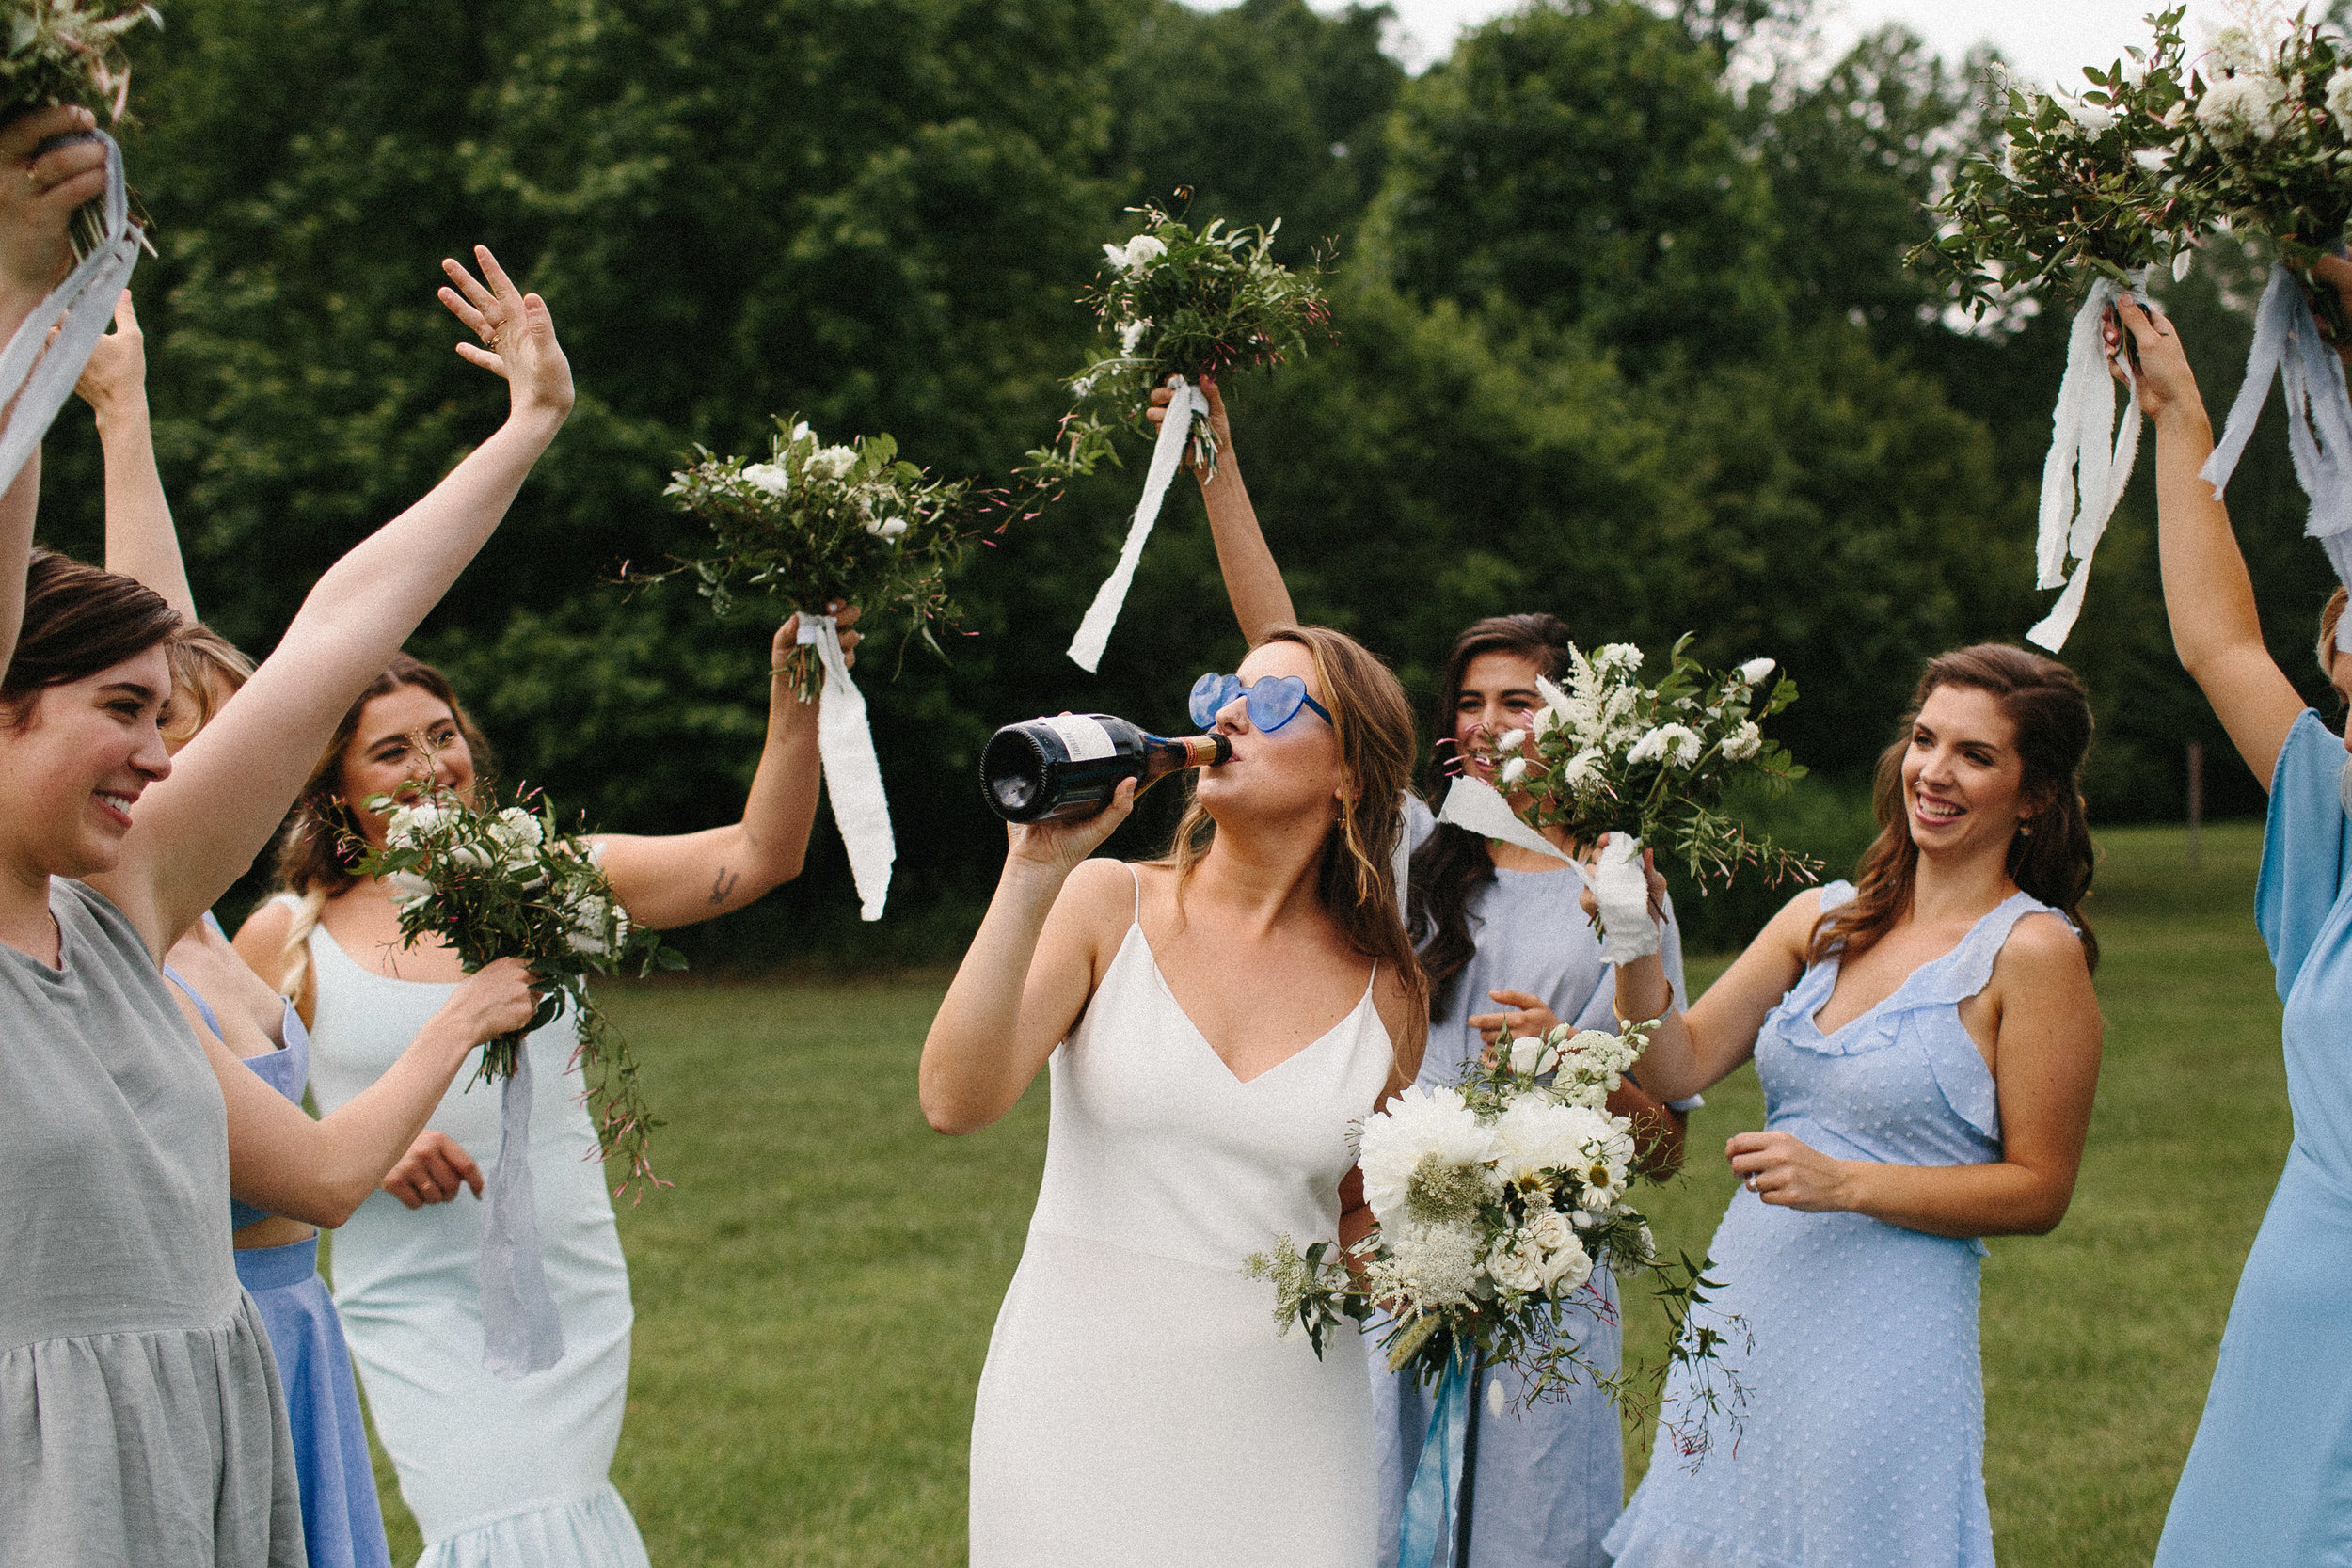 glen_ella_meadow_creekside_atlanta_wedding_photographers_1267.jpg